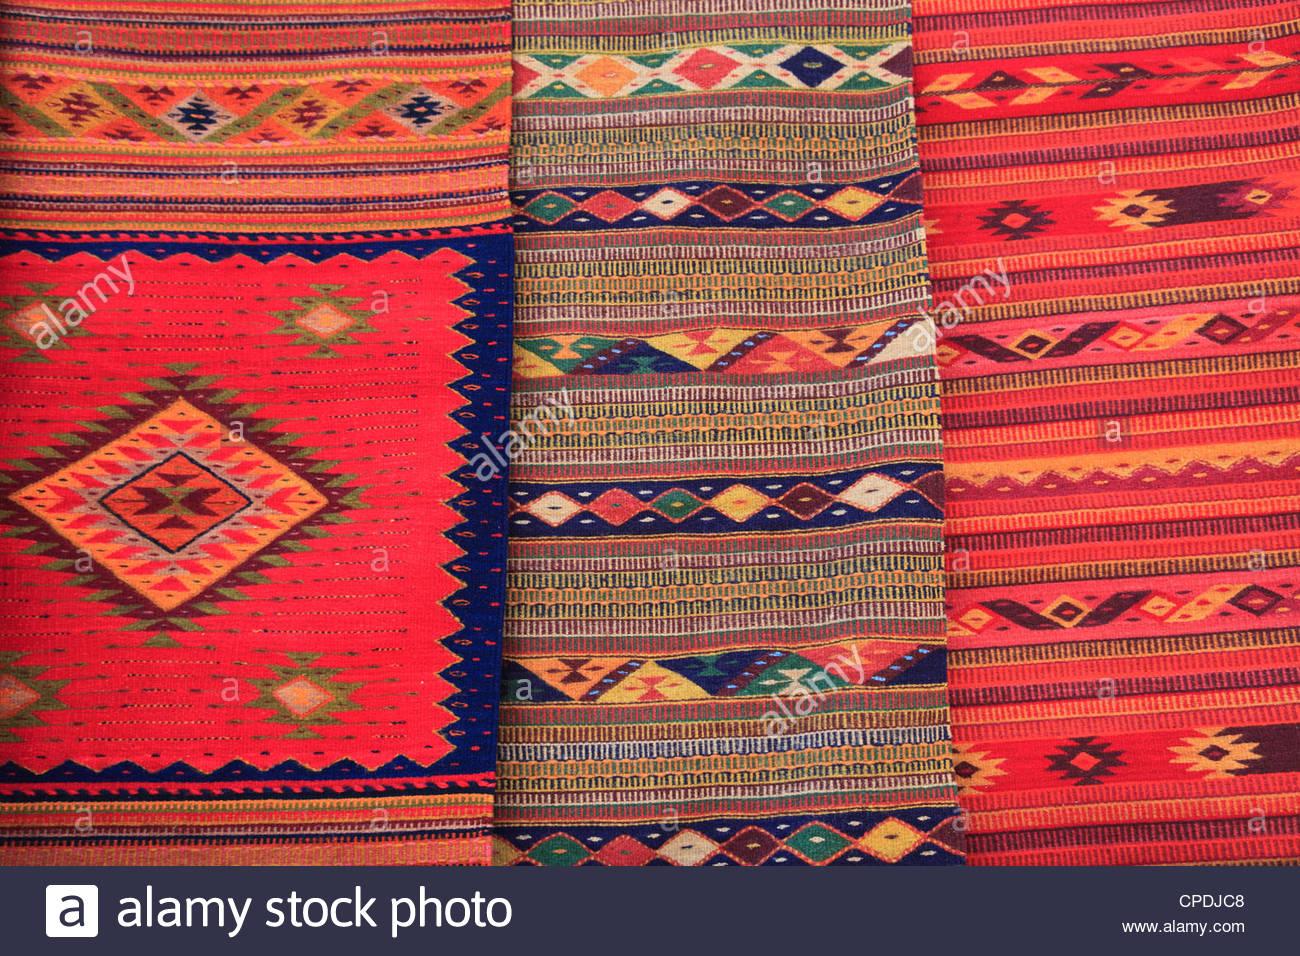 traditional hand woven rugs, oaxaca city, oaxaca, mexico, north america GNWDPIZ